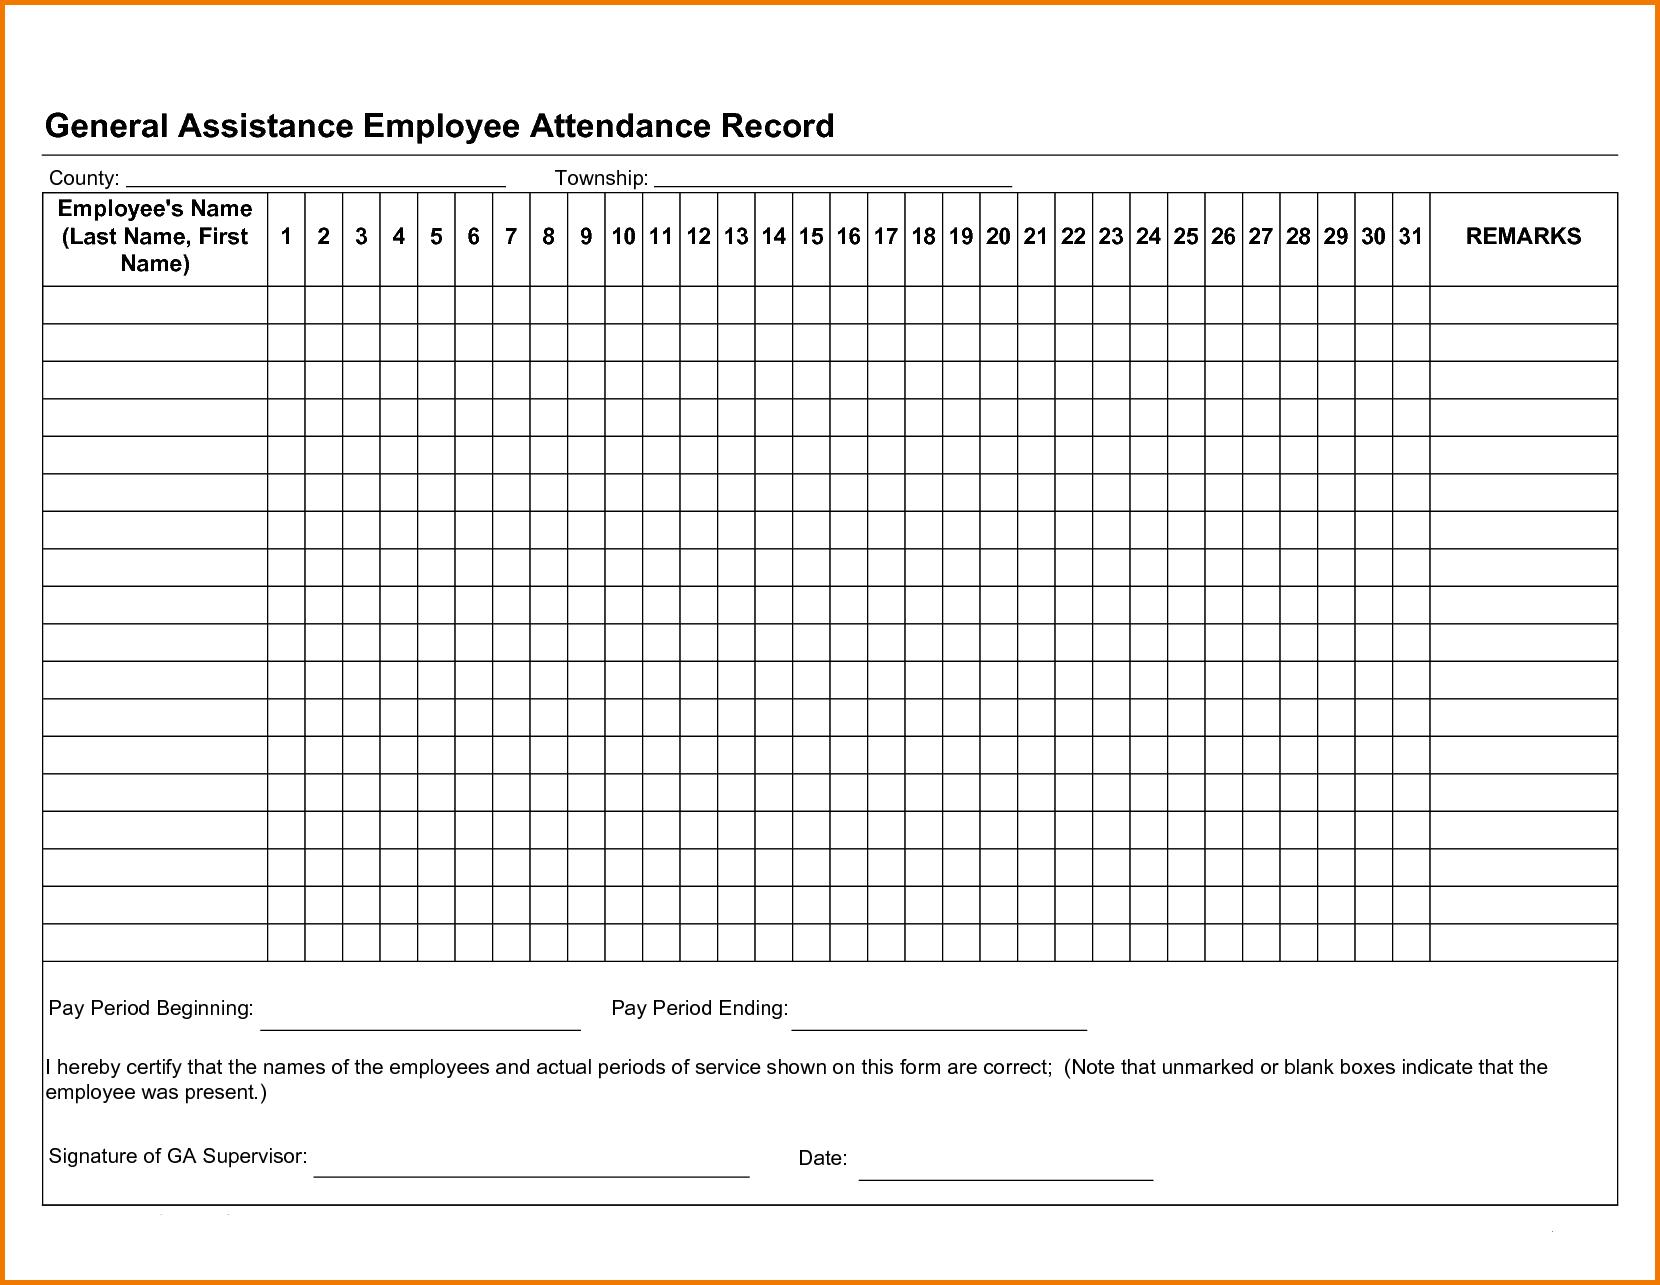 Free Employee Attendance Tracker Excel 2019 | Swimming Organization pertaining to Free Printable Employee Attendance Calendar Template